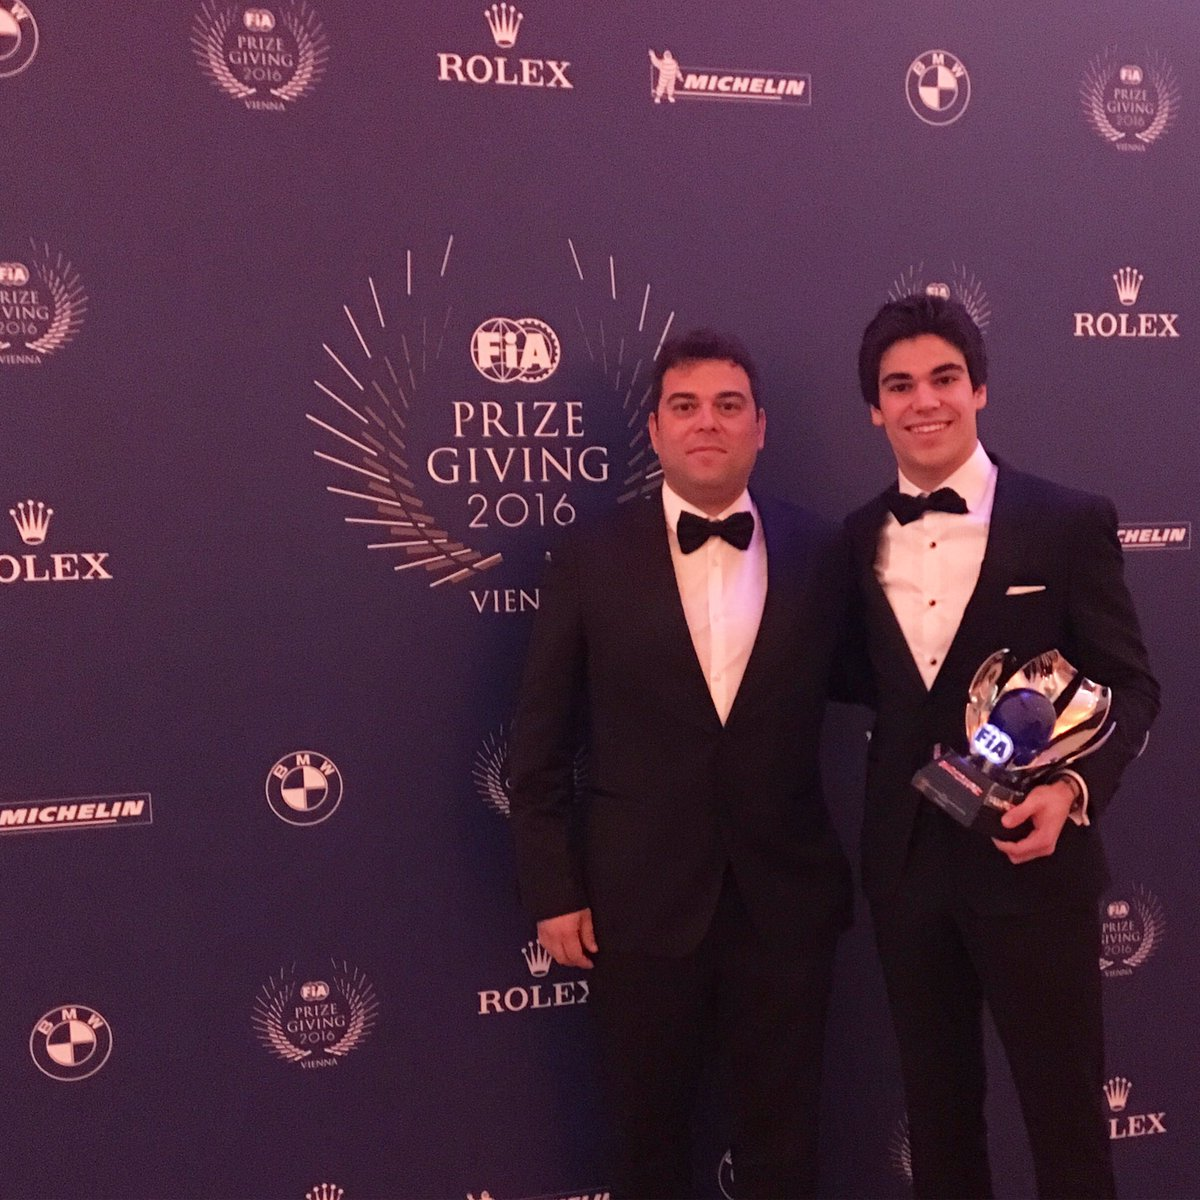 A year to remember #FIAPrizeGiving #Formula3 #EuropeanChampion @PREMA_Team